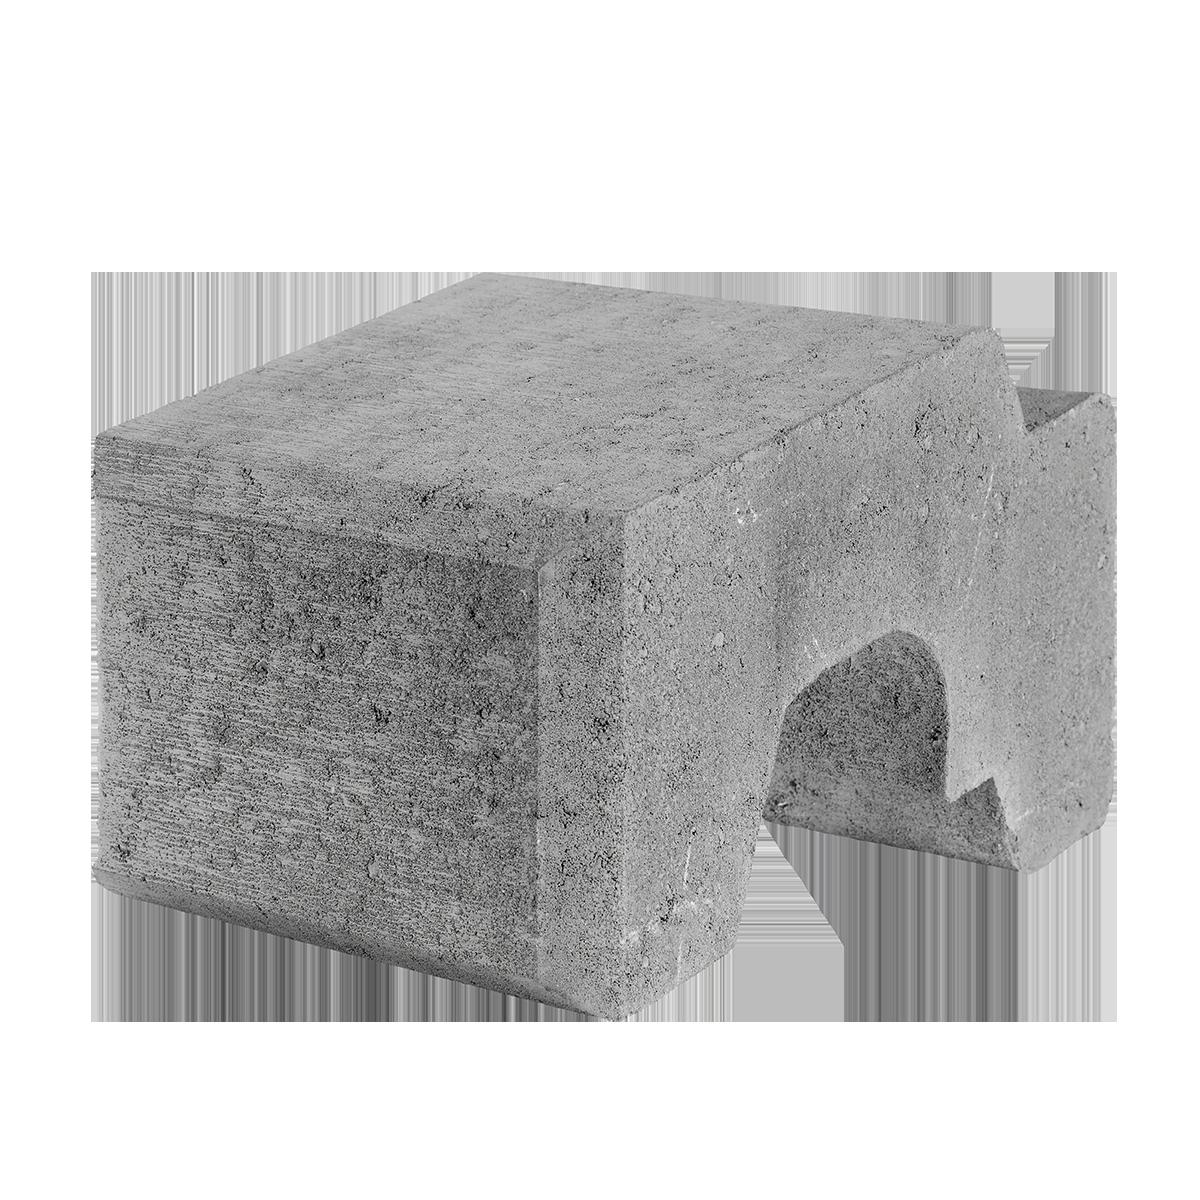 Danblokke 25x33x17 cm Grå Normal